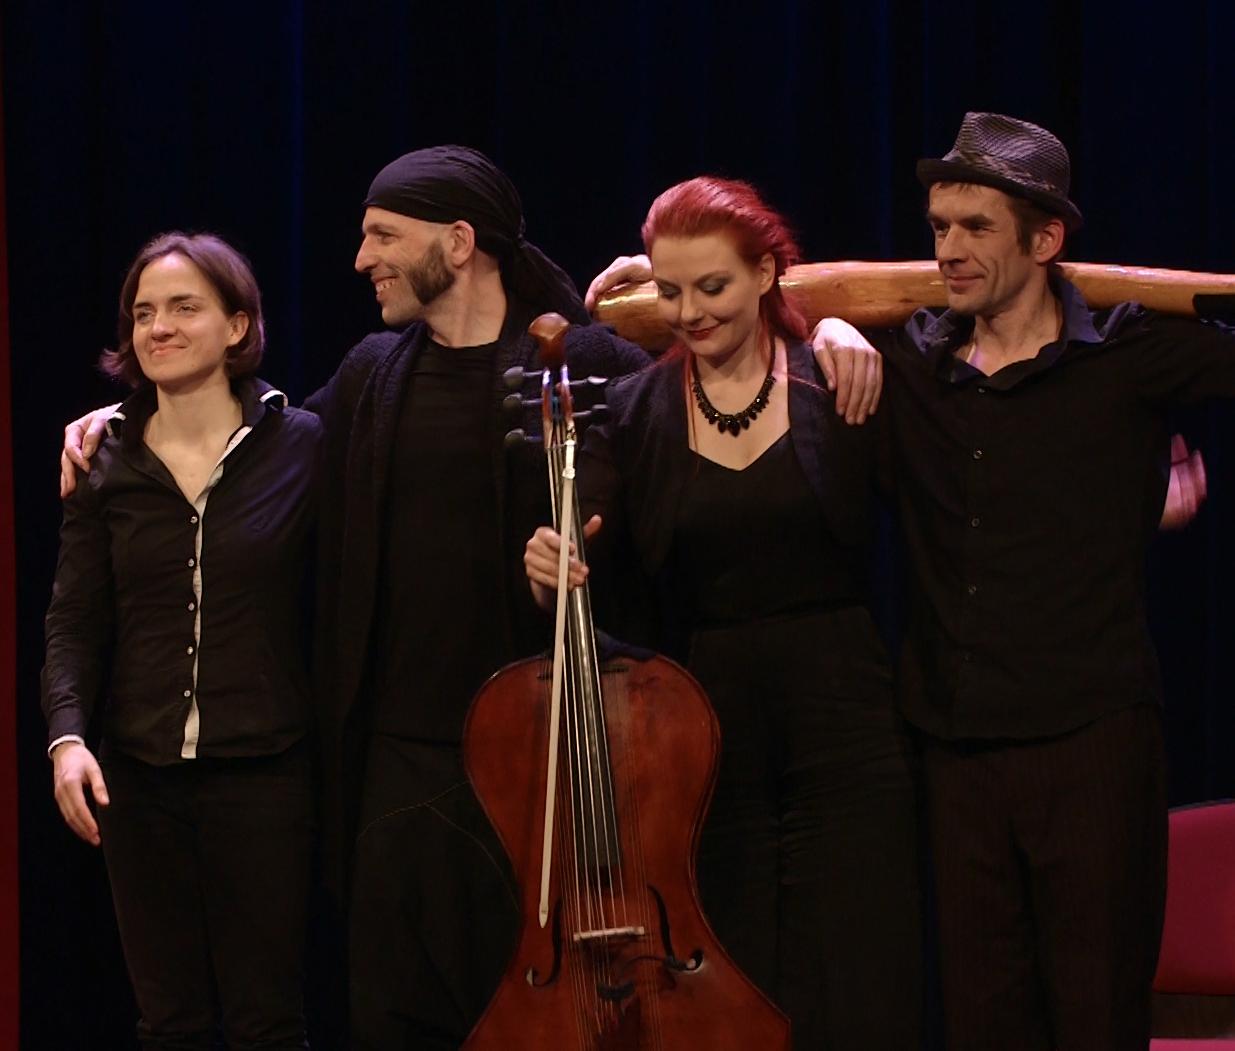 20170421 Musik mit Obertongesang O.Ton Projekt in der ufaFabrik 01